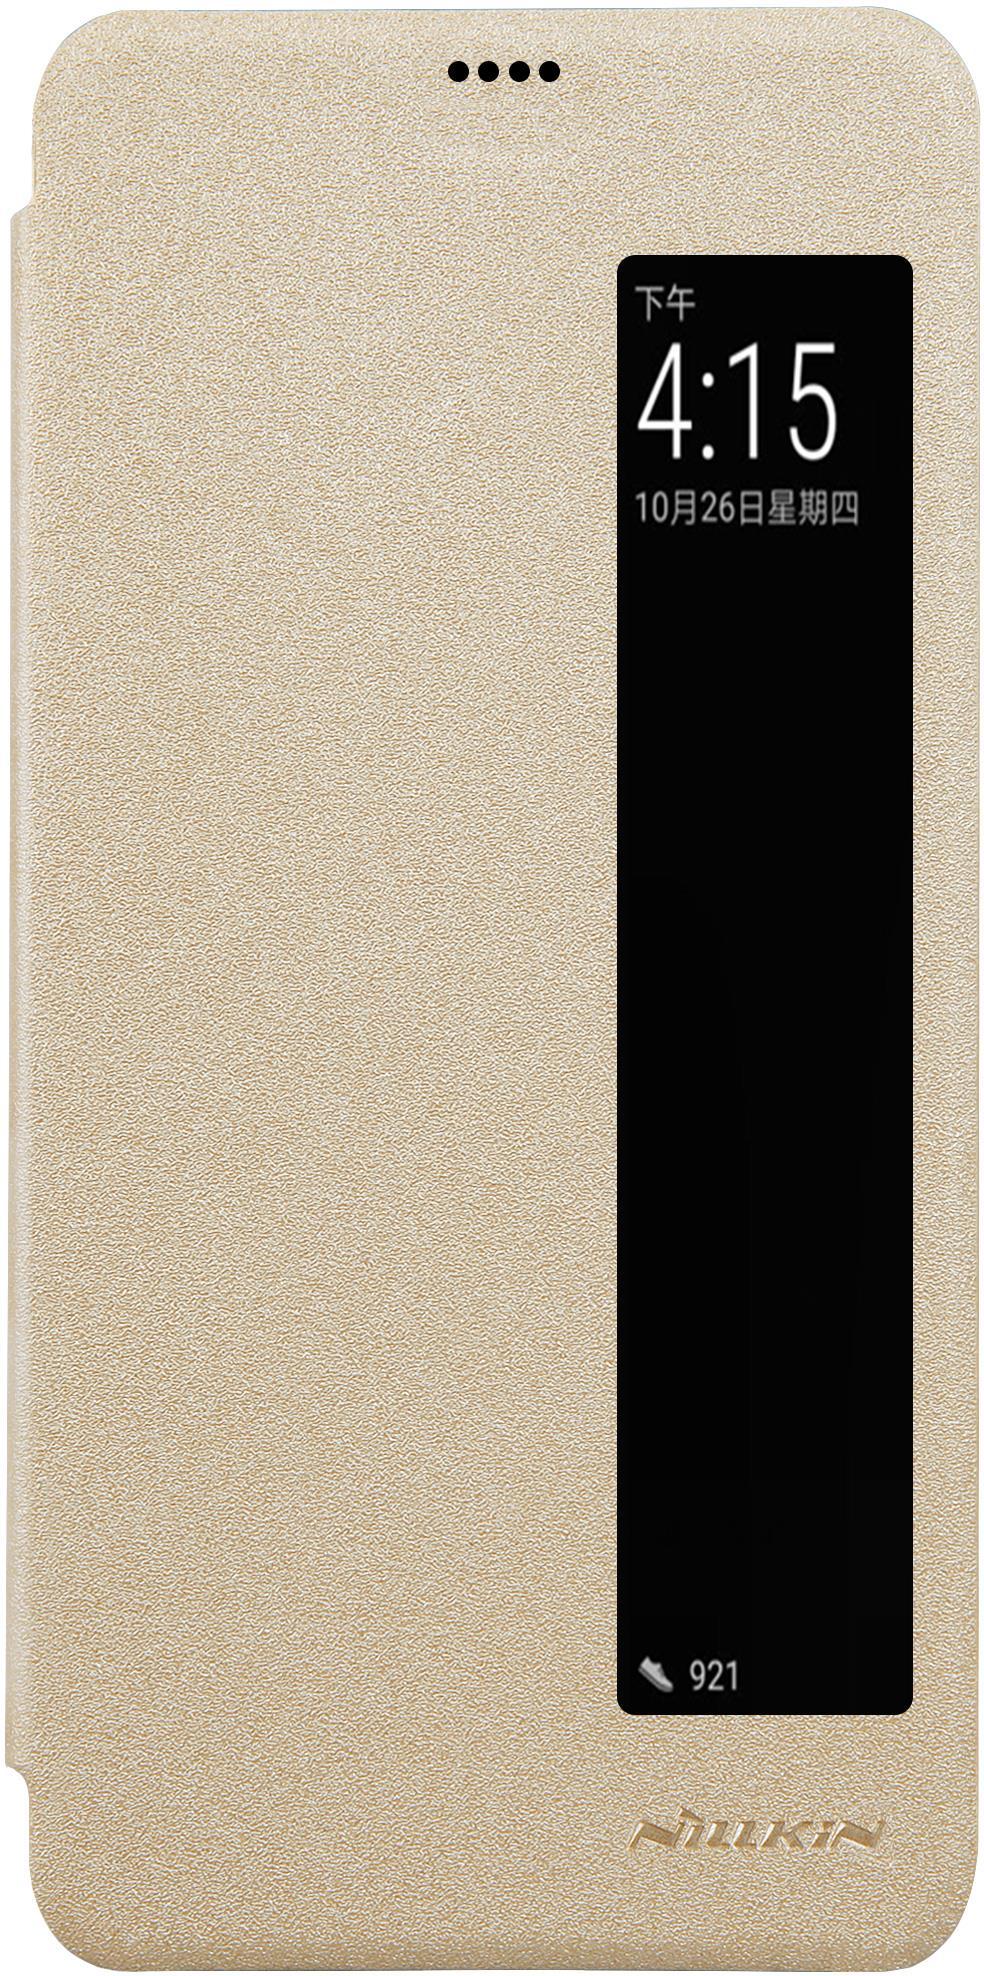 Чехол для сотового телефона Nillkin T-N-HP20-009, золотой чехол для сотового телефона nillkin sparkle 6902048161108 золотой